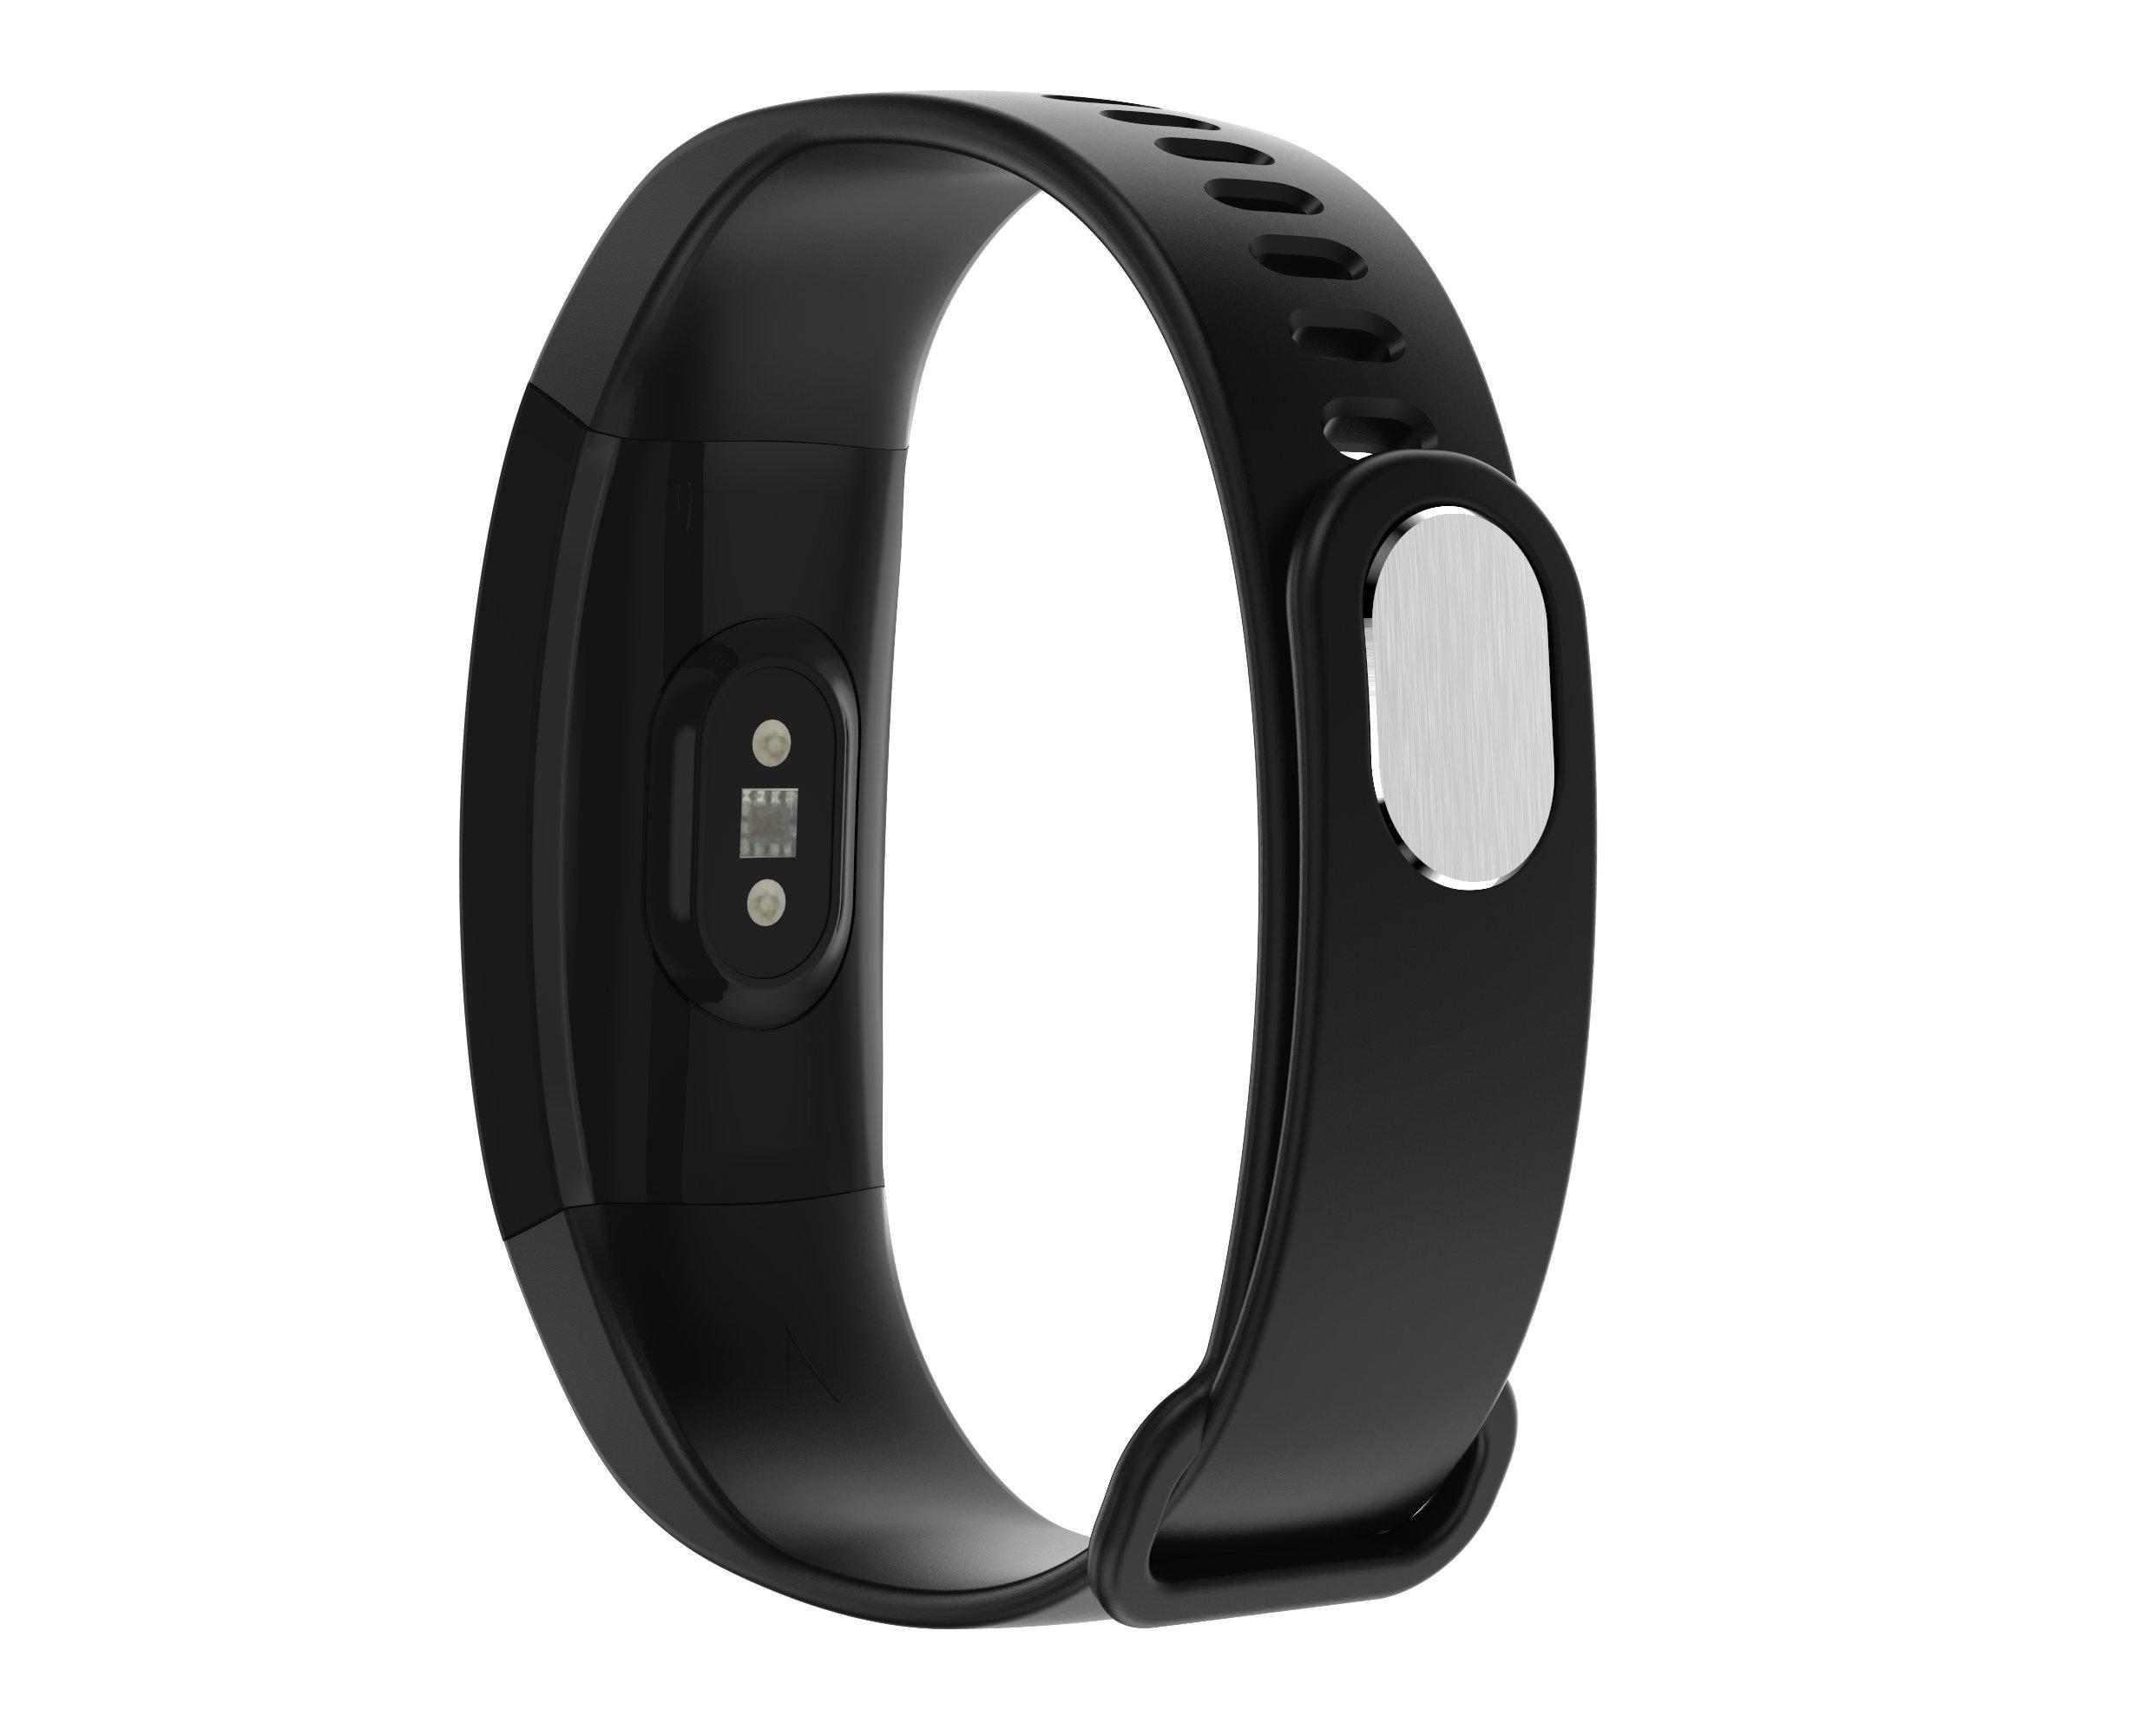 719IkPTTkpL - Fitness Tracker Heart Rate Monitor Pedometer Smart Bracelet Bluetooth 4.0 Smart Fitness Band and Activity Tracker Smartwatch